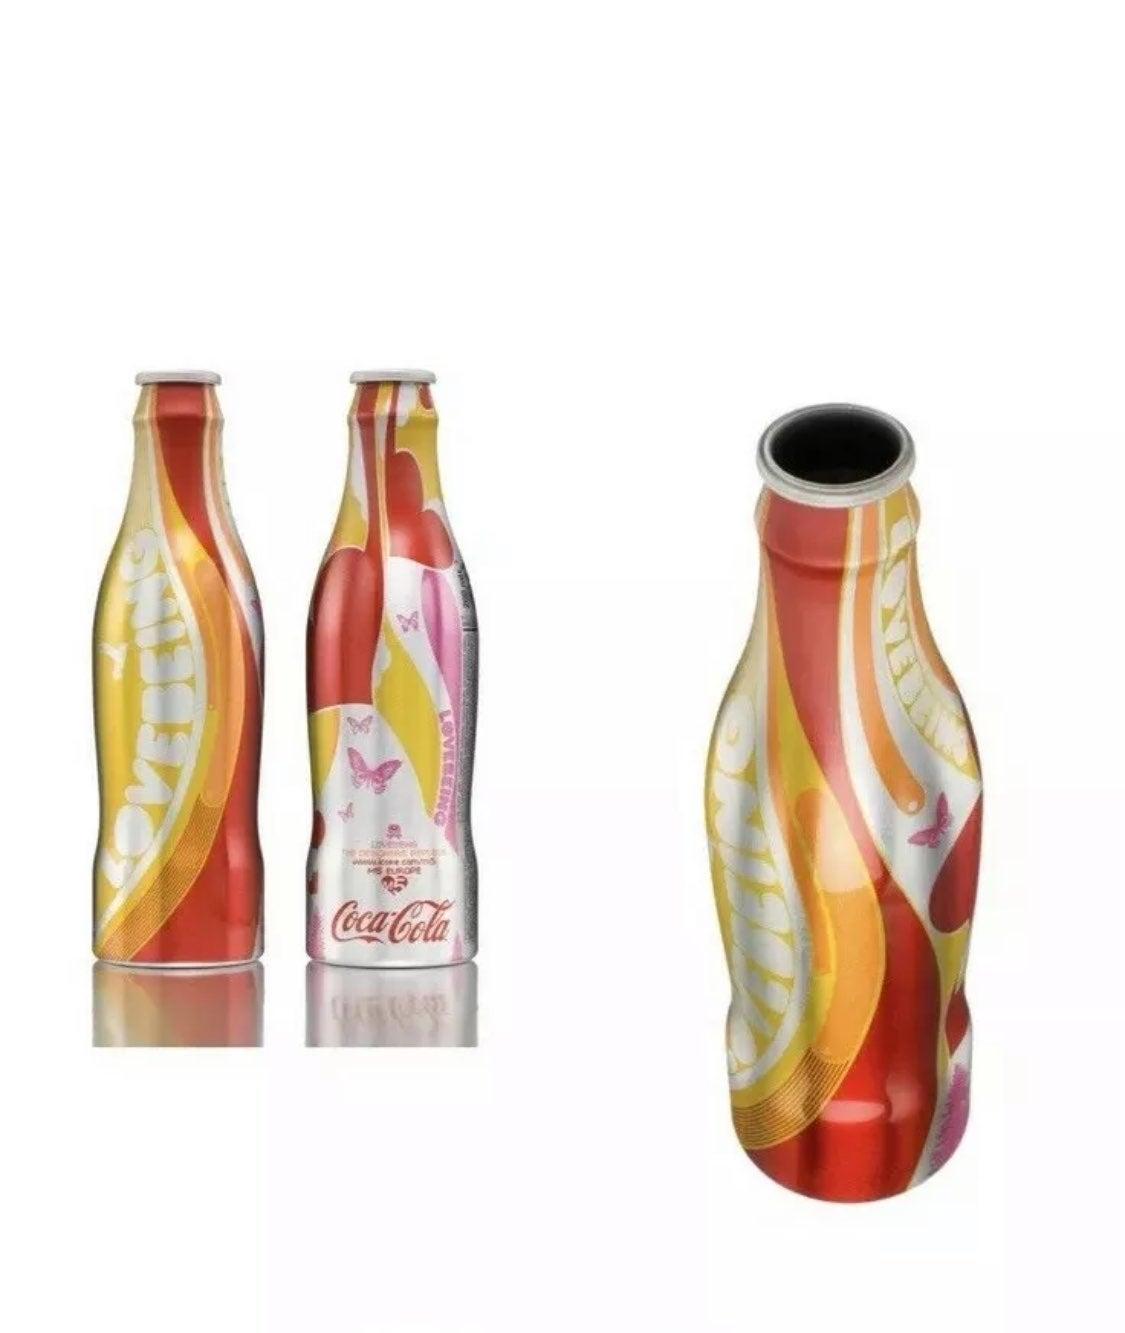 NEW Ltd Ed Love Being Coca-Cola bottle